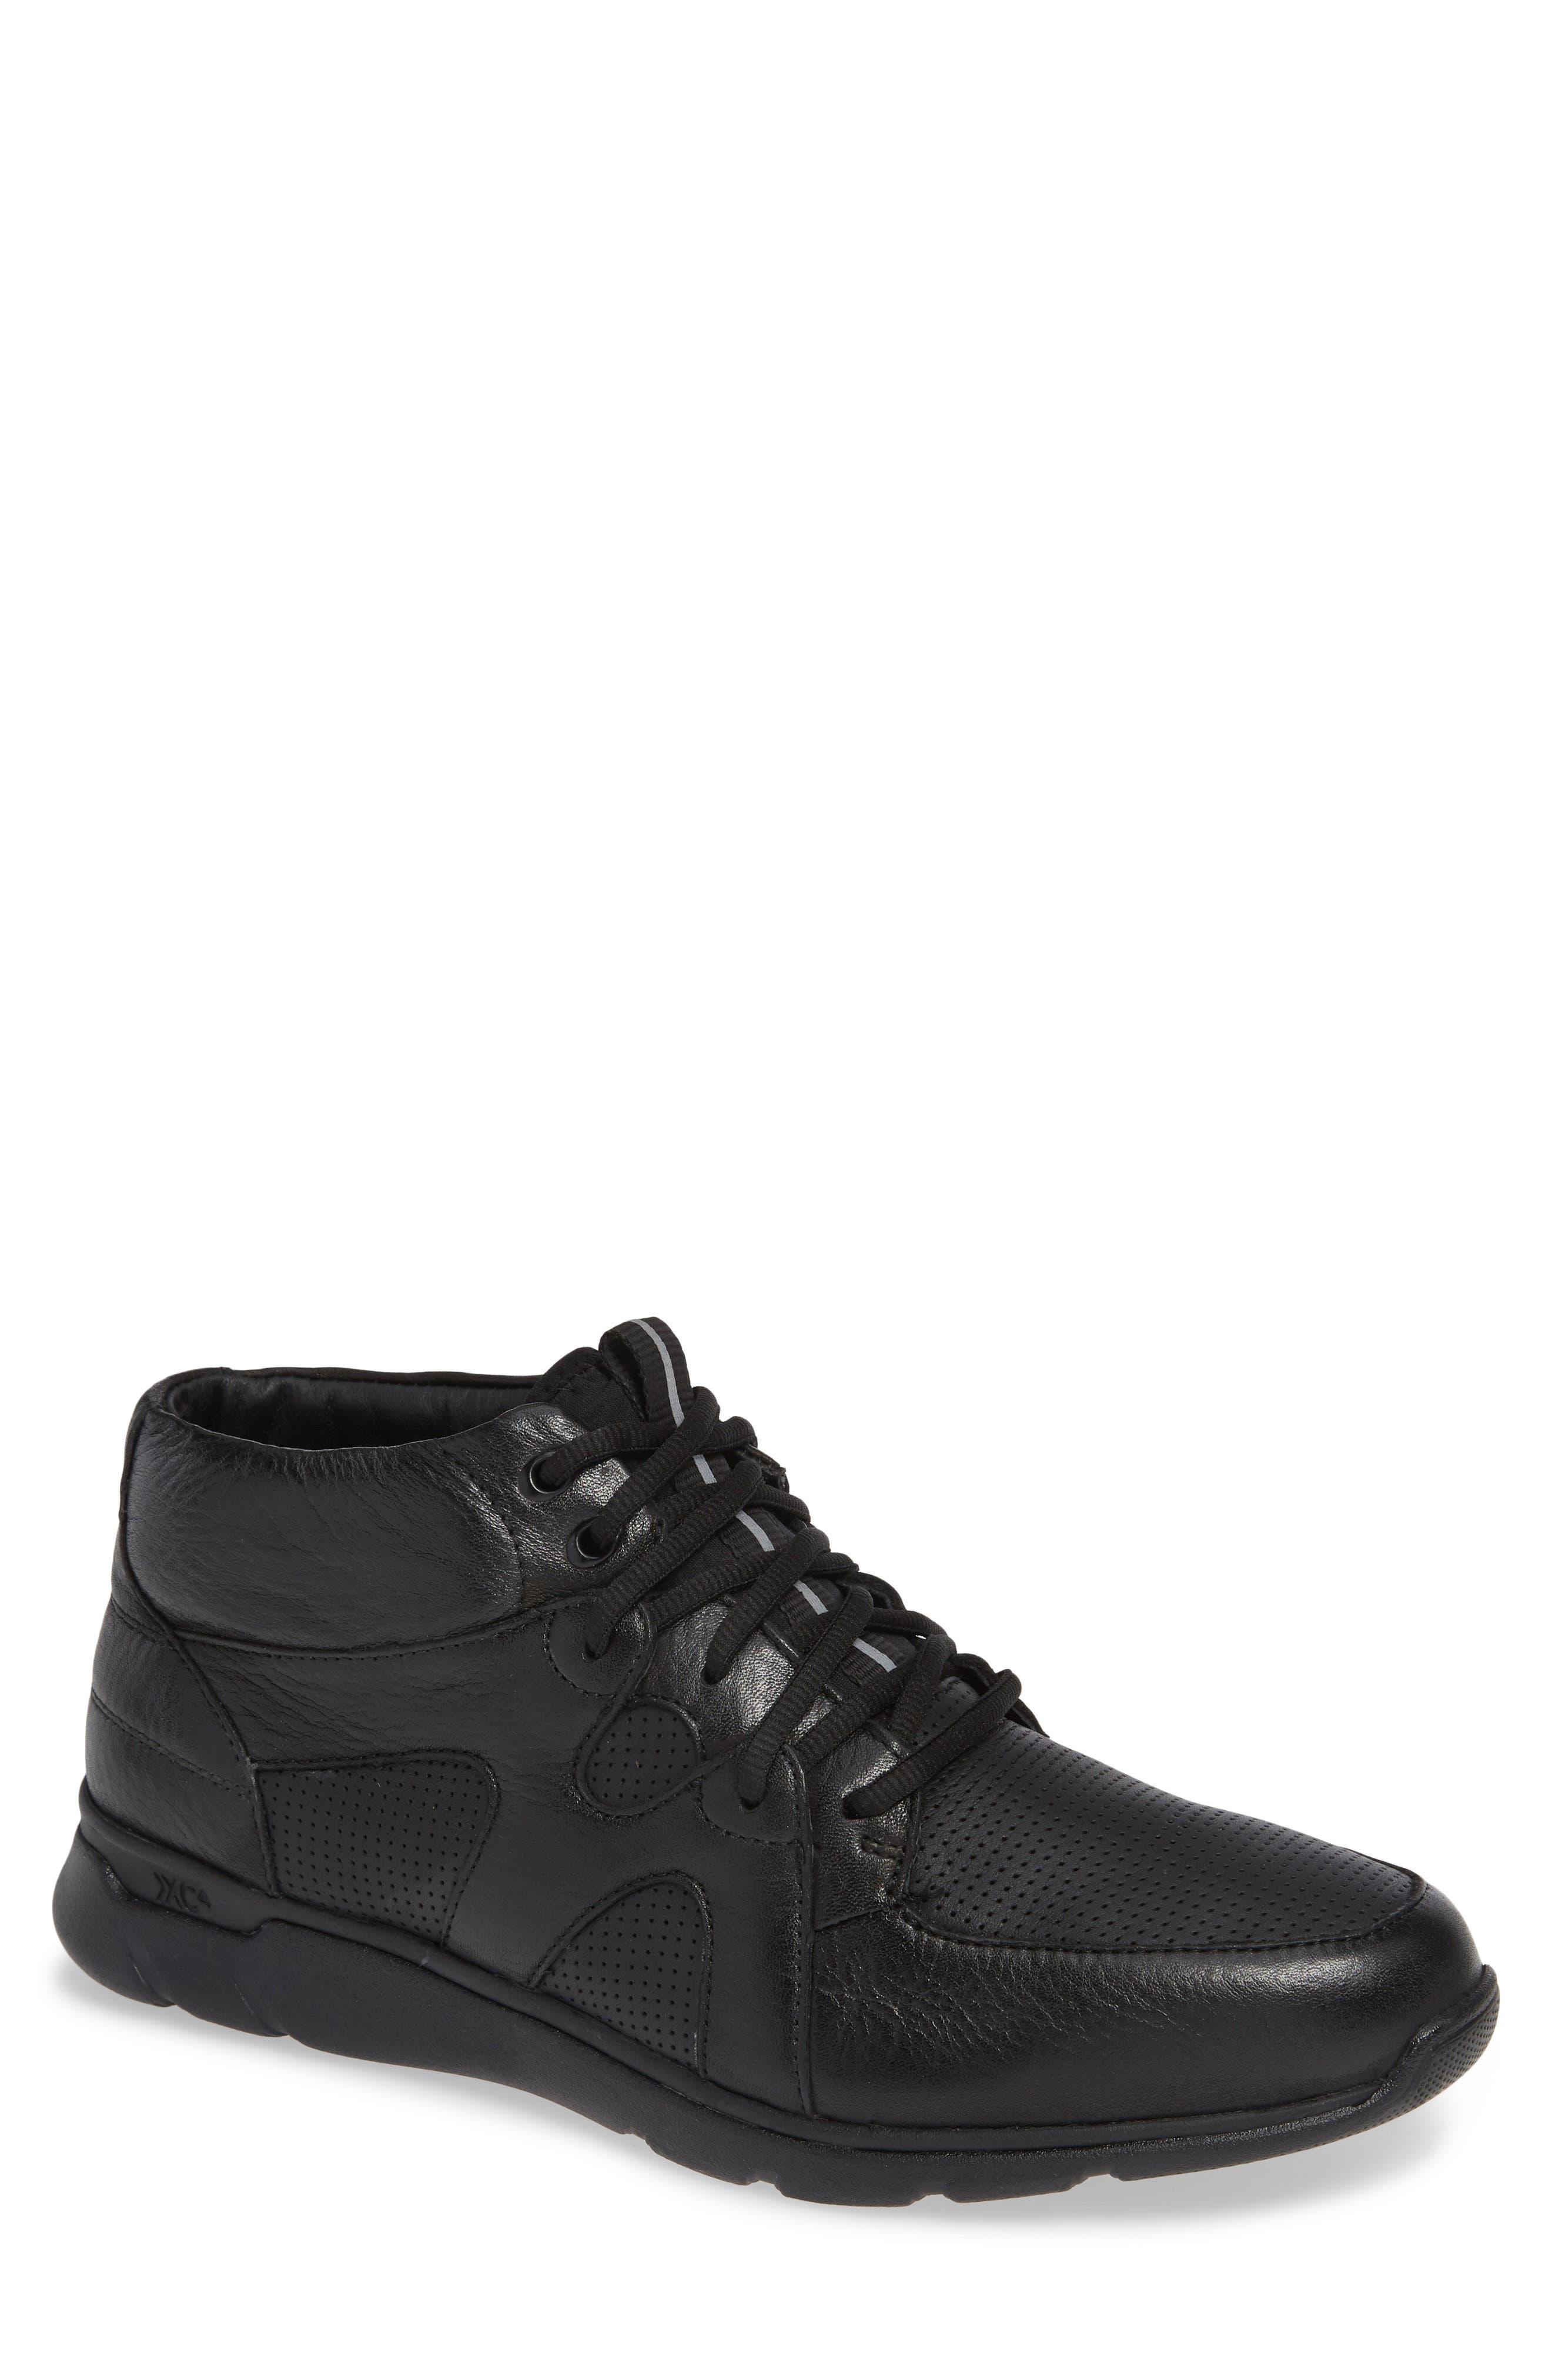 Johnston & Murphy Prentiss Waterproof Sneaker, Black